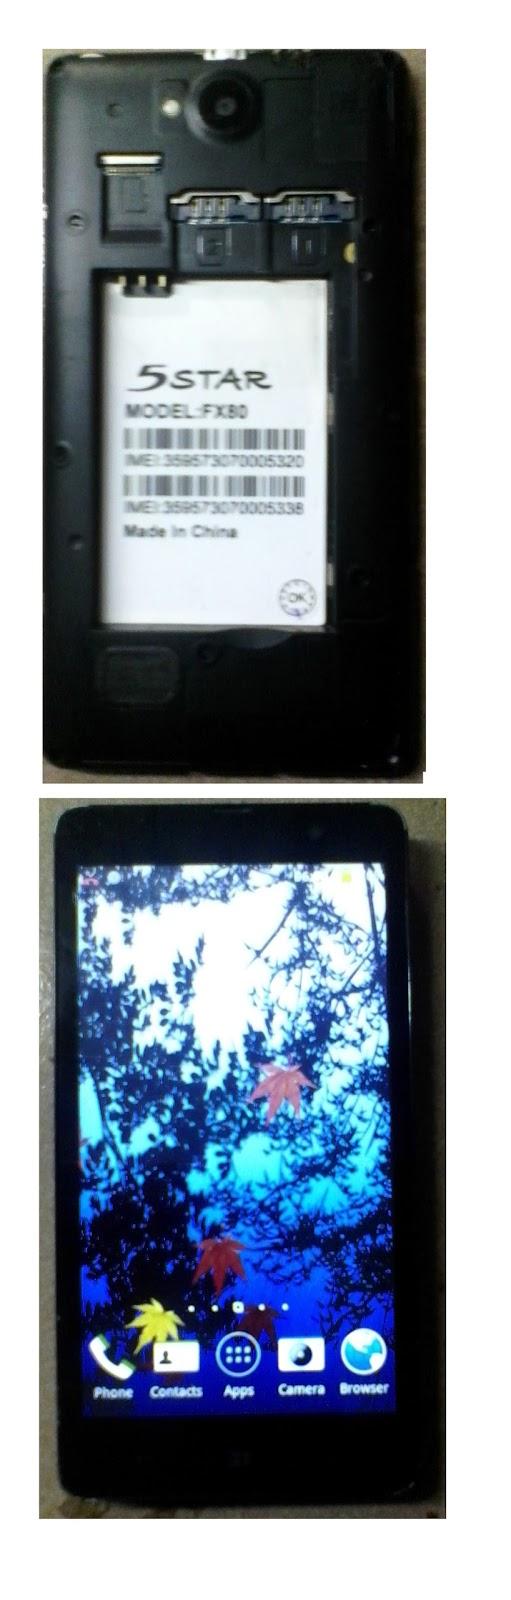 Image result for 5 star fx80